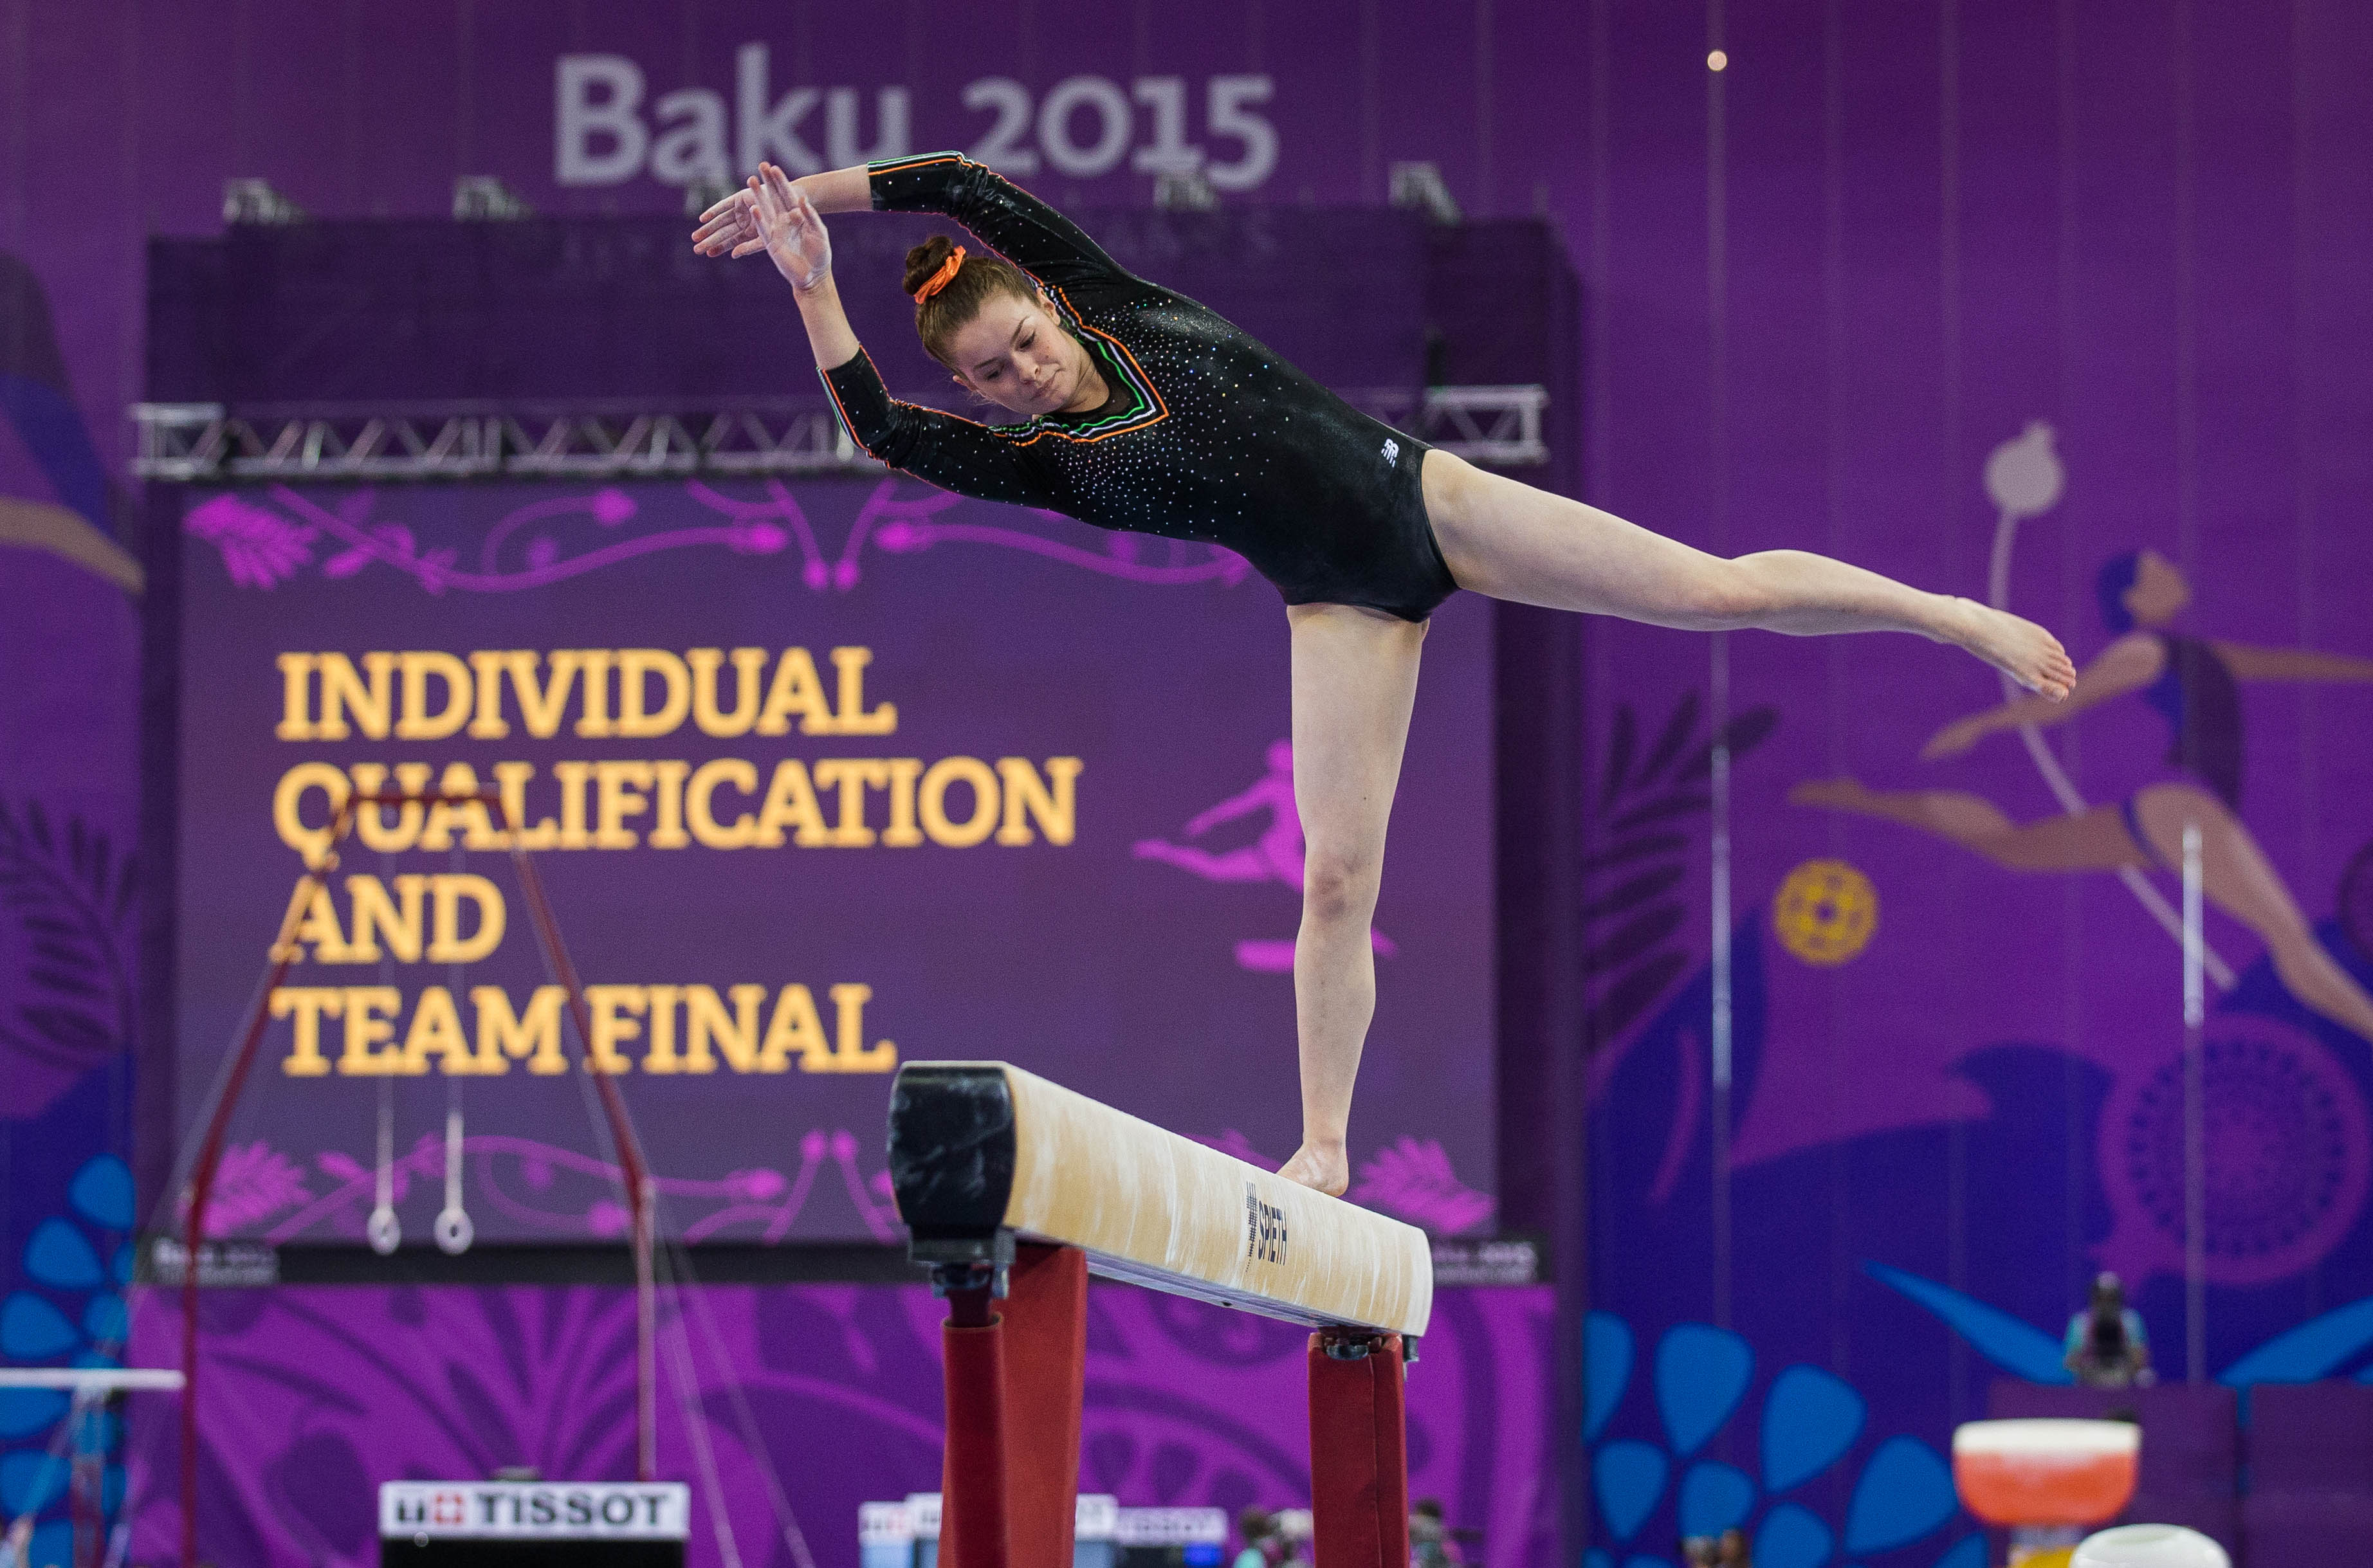 Baku 2015 European Games, National Gymnastics Arena, Baku, Azerbaijan 15/6/2015 Gymnastics Artistic Ireland's Nicole Mawhinney Mandatory Credit ©INPHO/Ryan Byrne